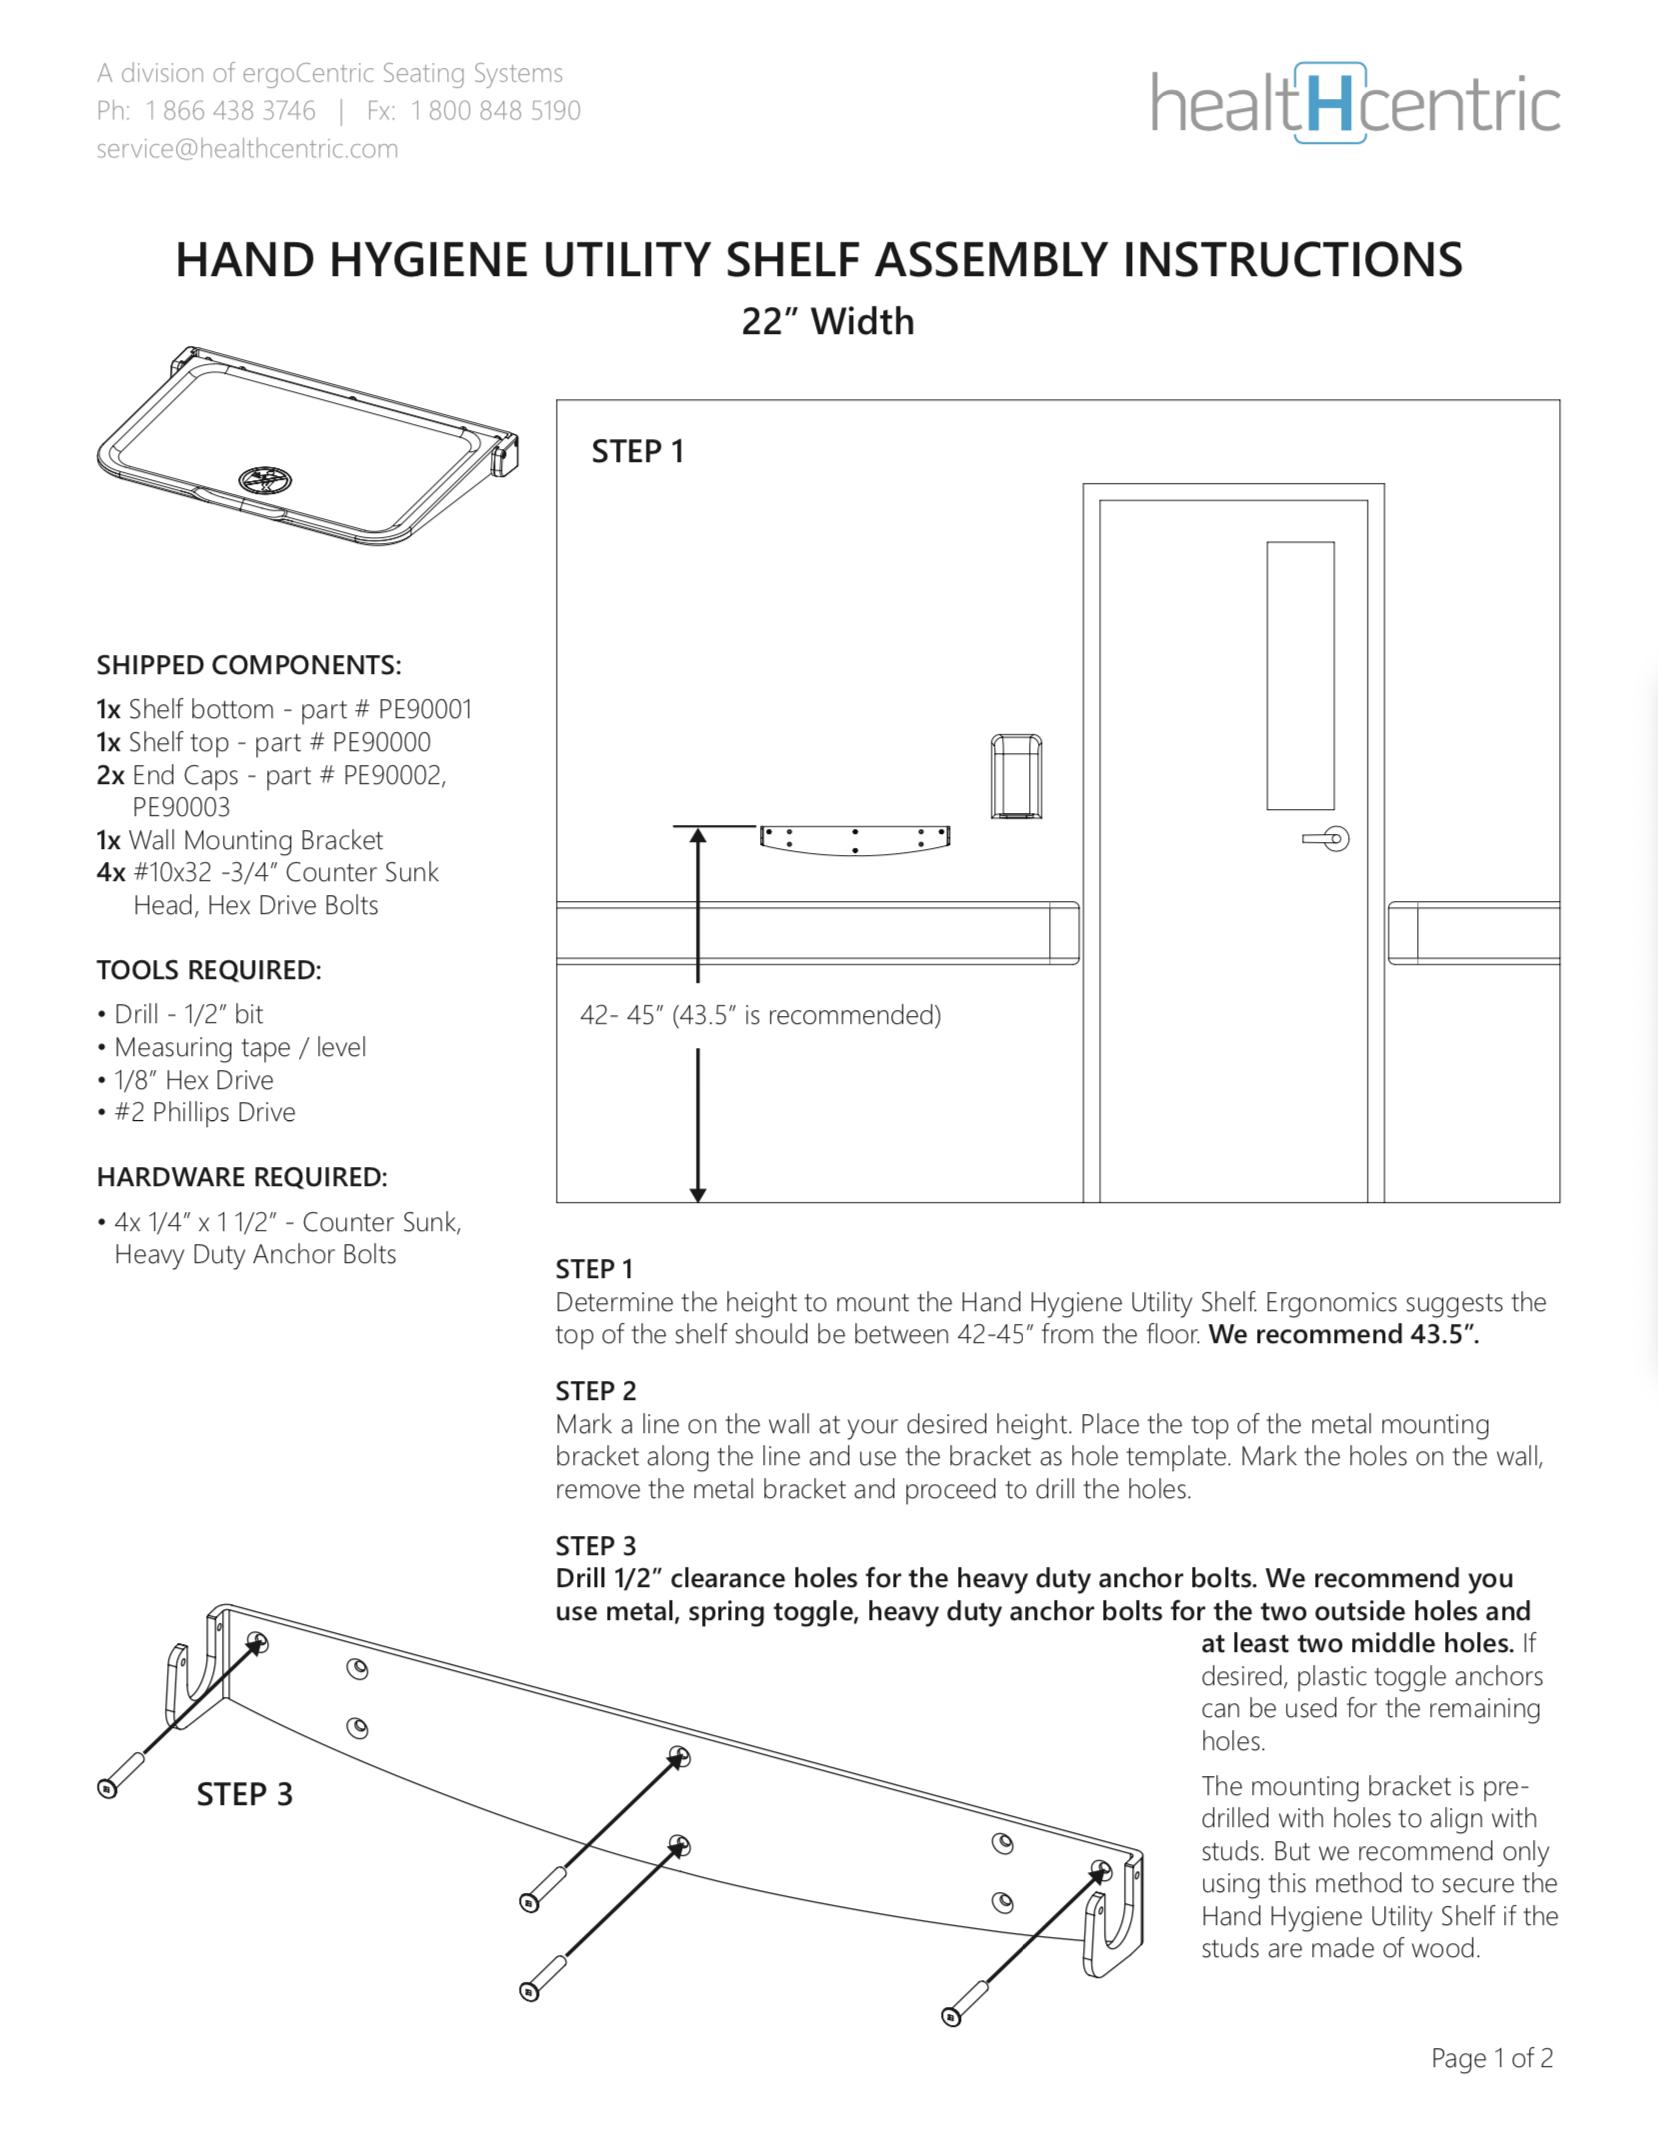 Hand Hygiene Utility Shelf – Assembly Instructions